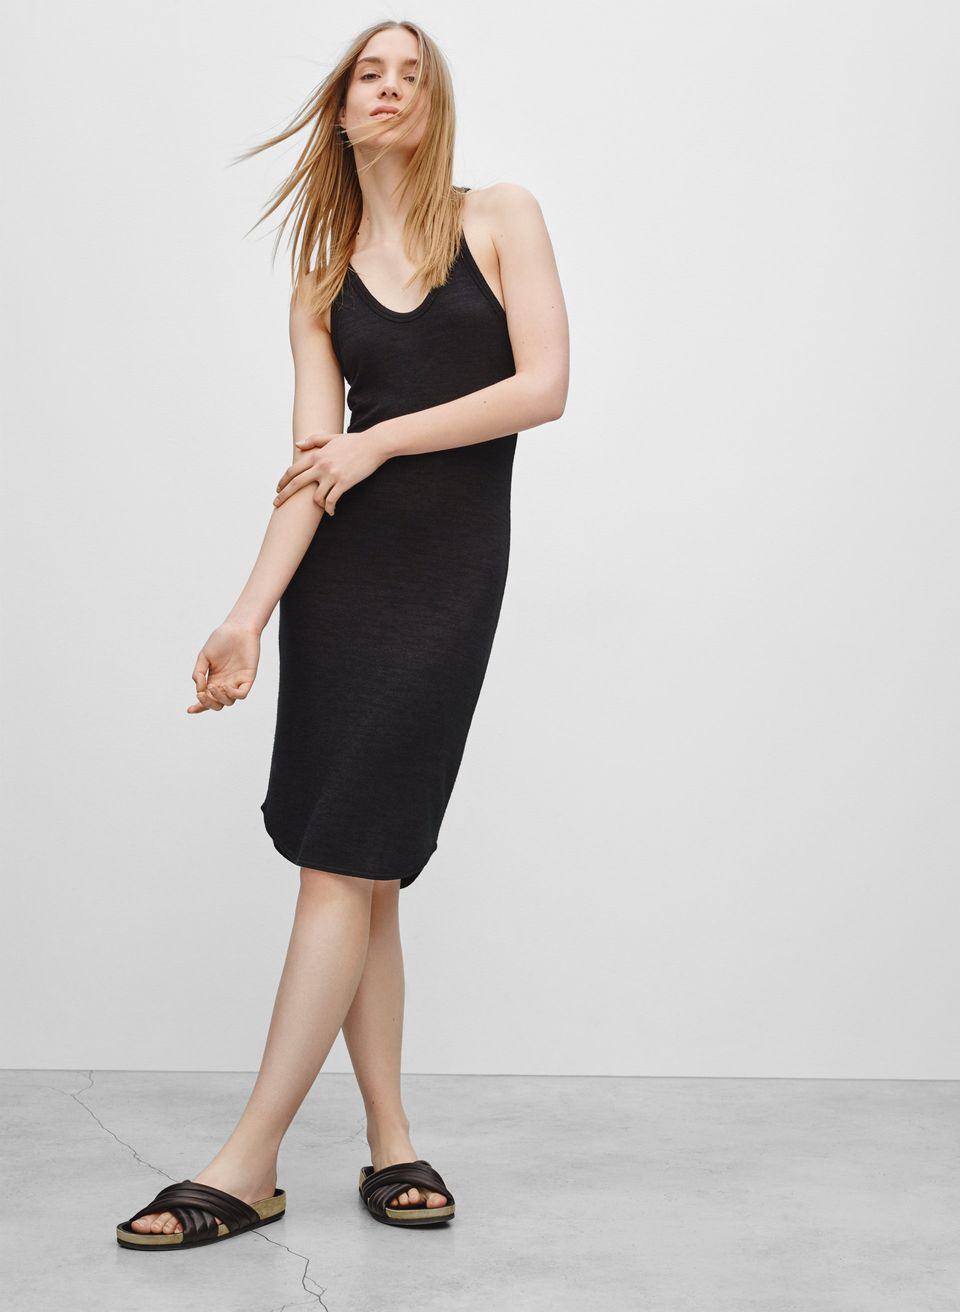 "$60. Available at <a href=""http://aritzia.com/en/product/yasmin-dress/48388.html?dwvar_48388_color=1274"" target=""_blank"">Arit"